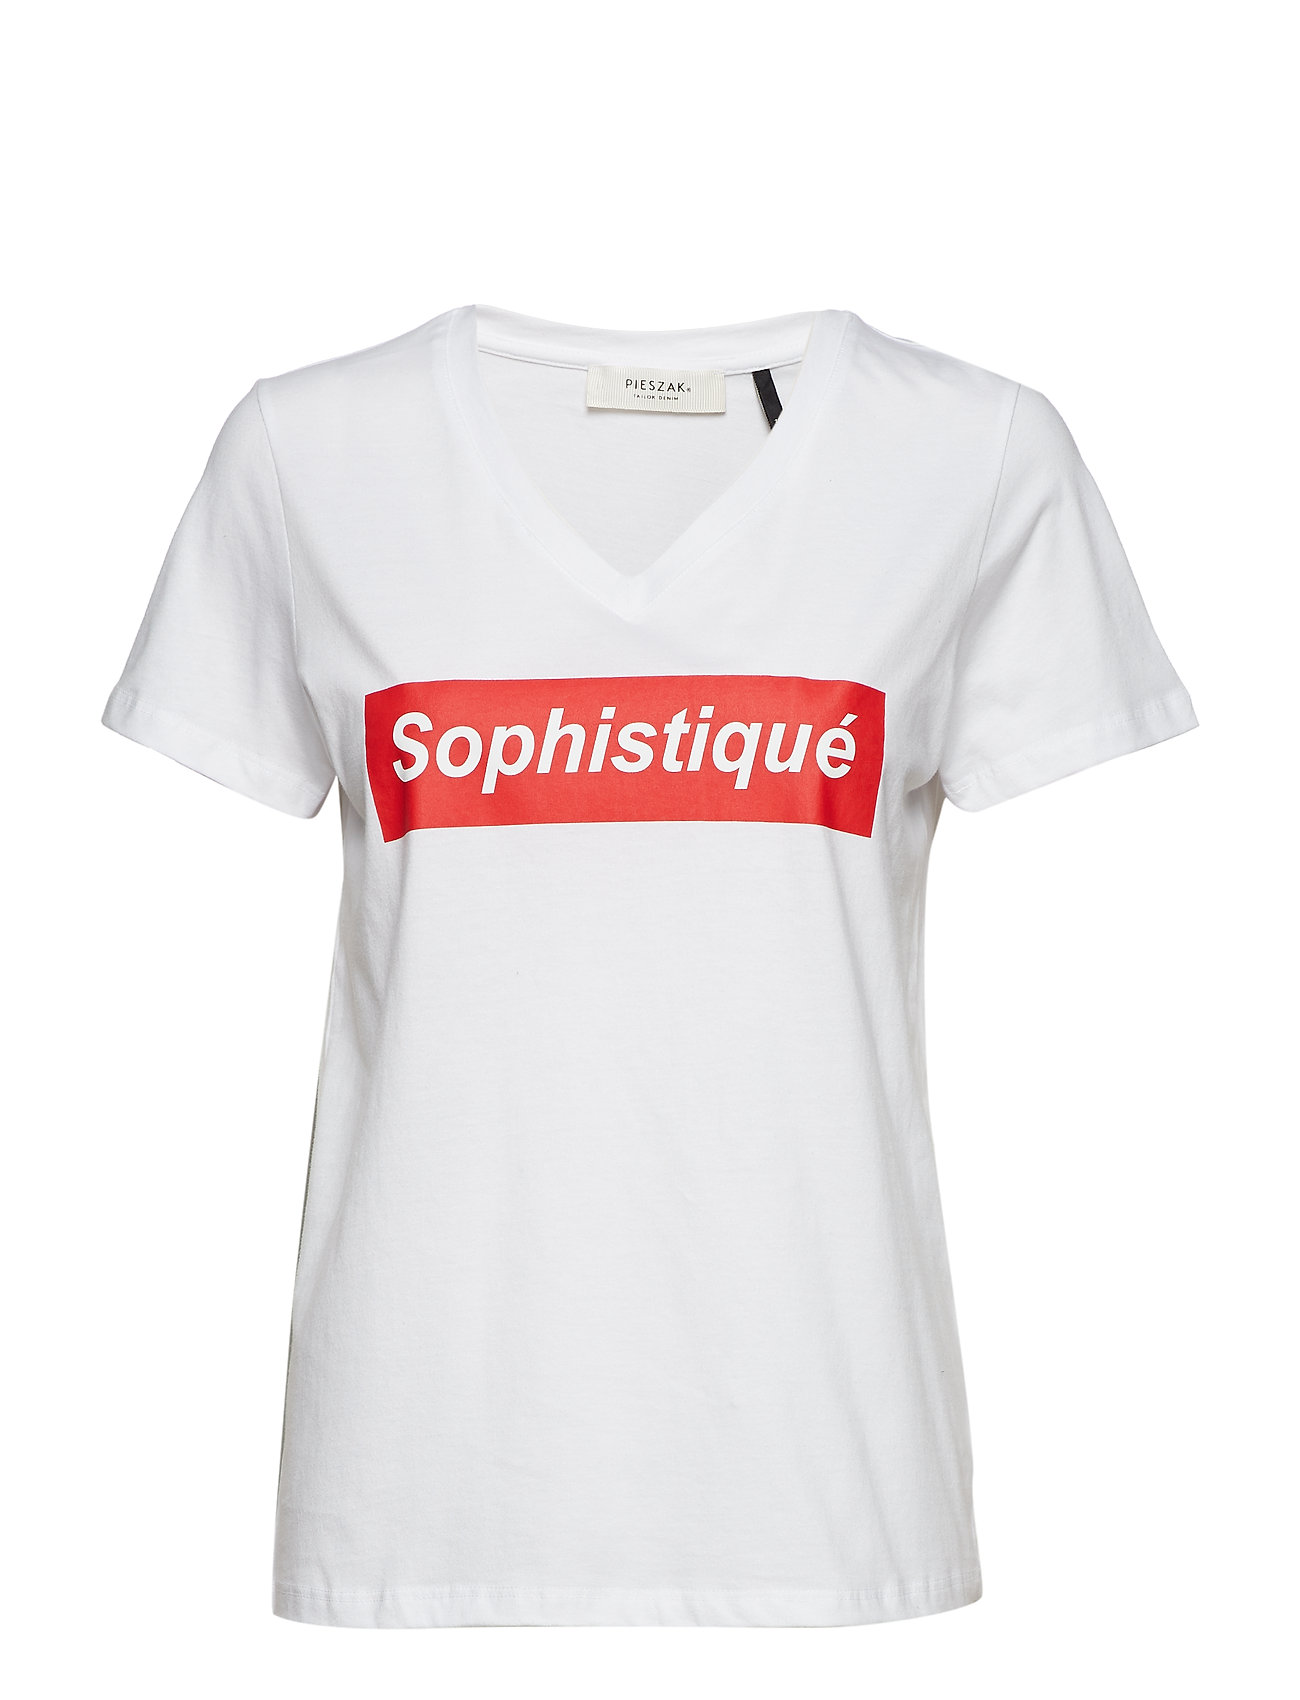 Sophistique Teeflash Ss RedPieszak Teeflash RedPieszak Sophistique Sophistique Teeflash Ss Ss Sophistique Teeflash Ss RedPieszak uJc3lF1TK